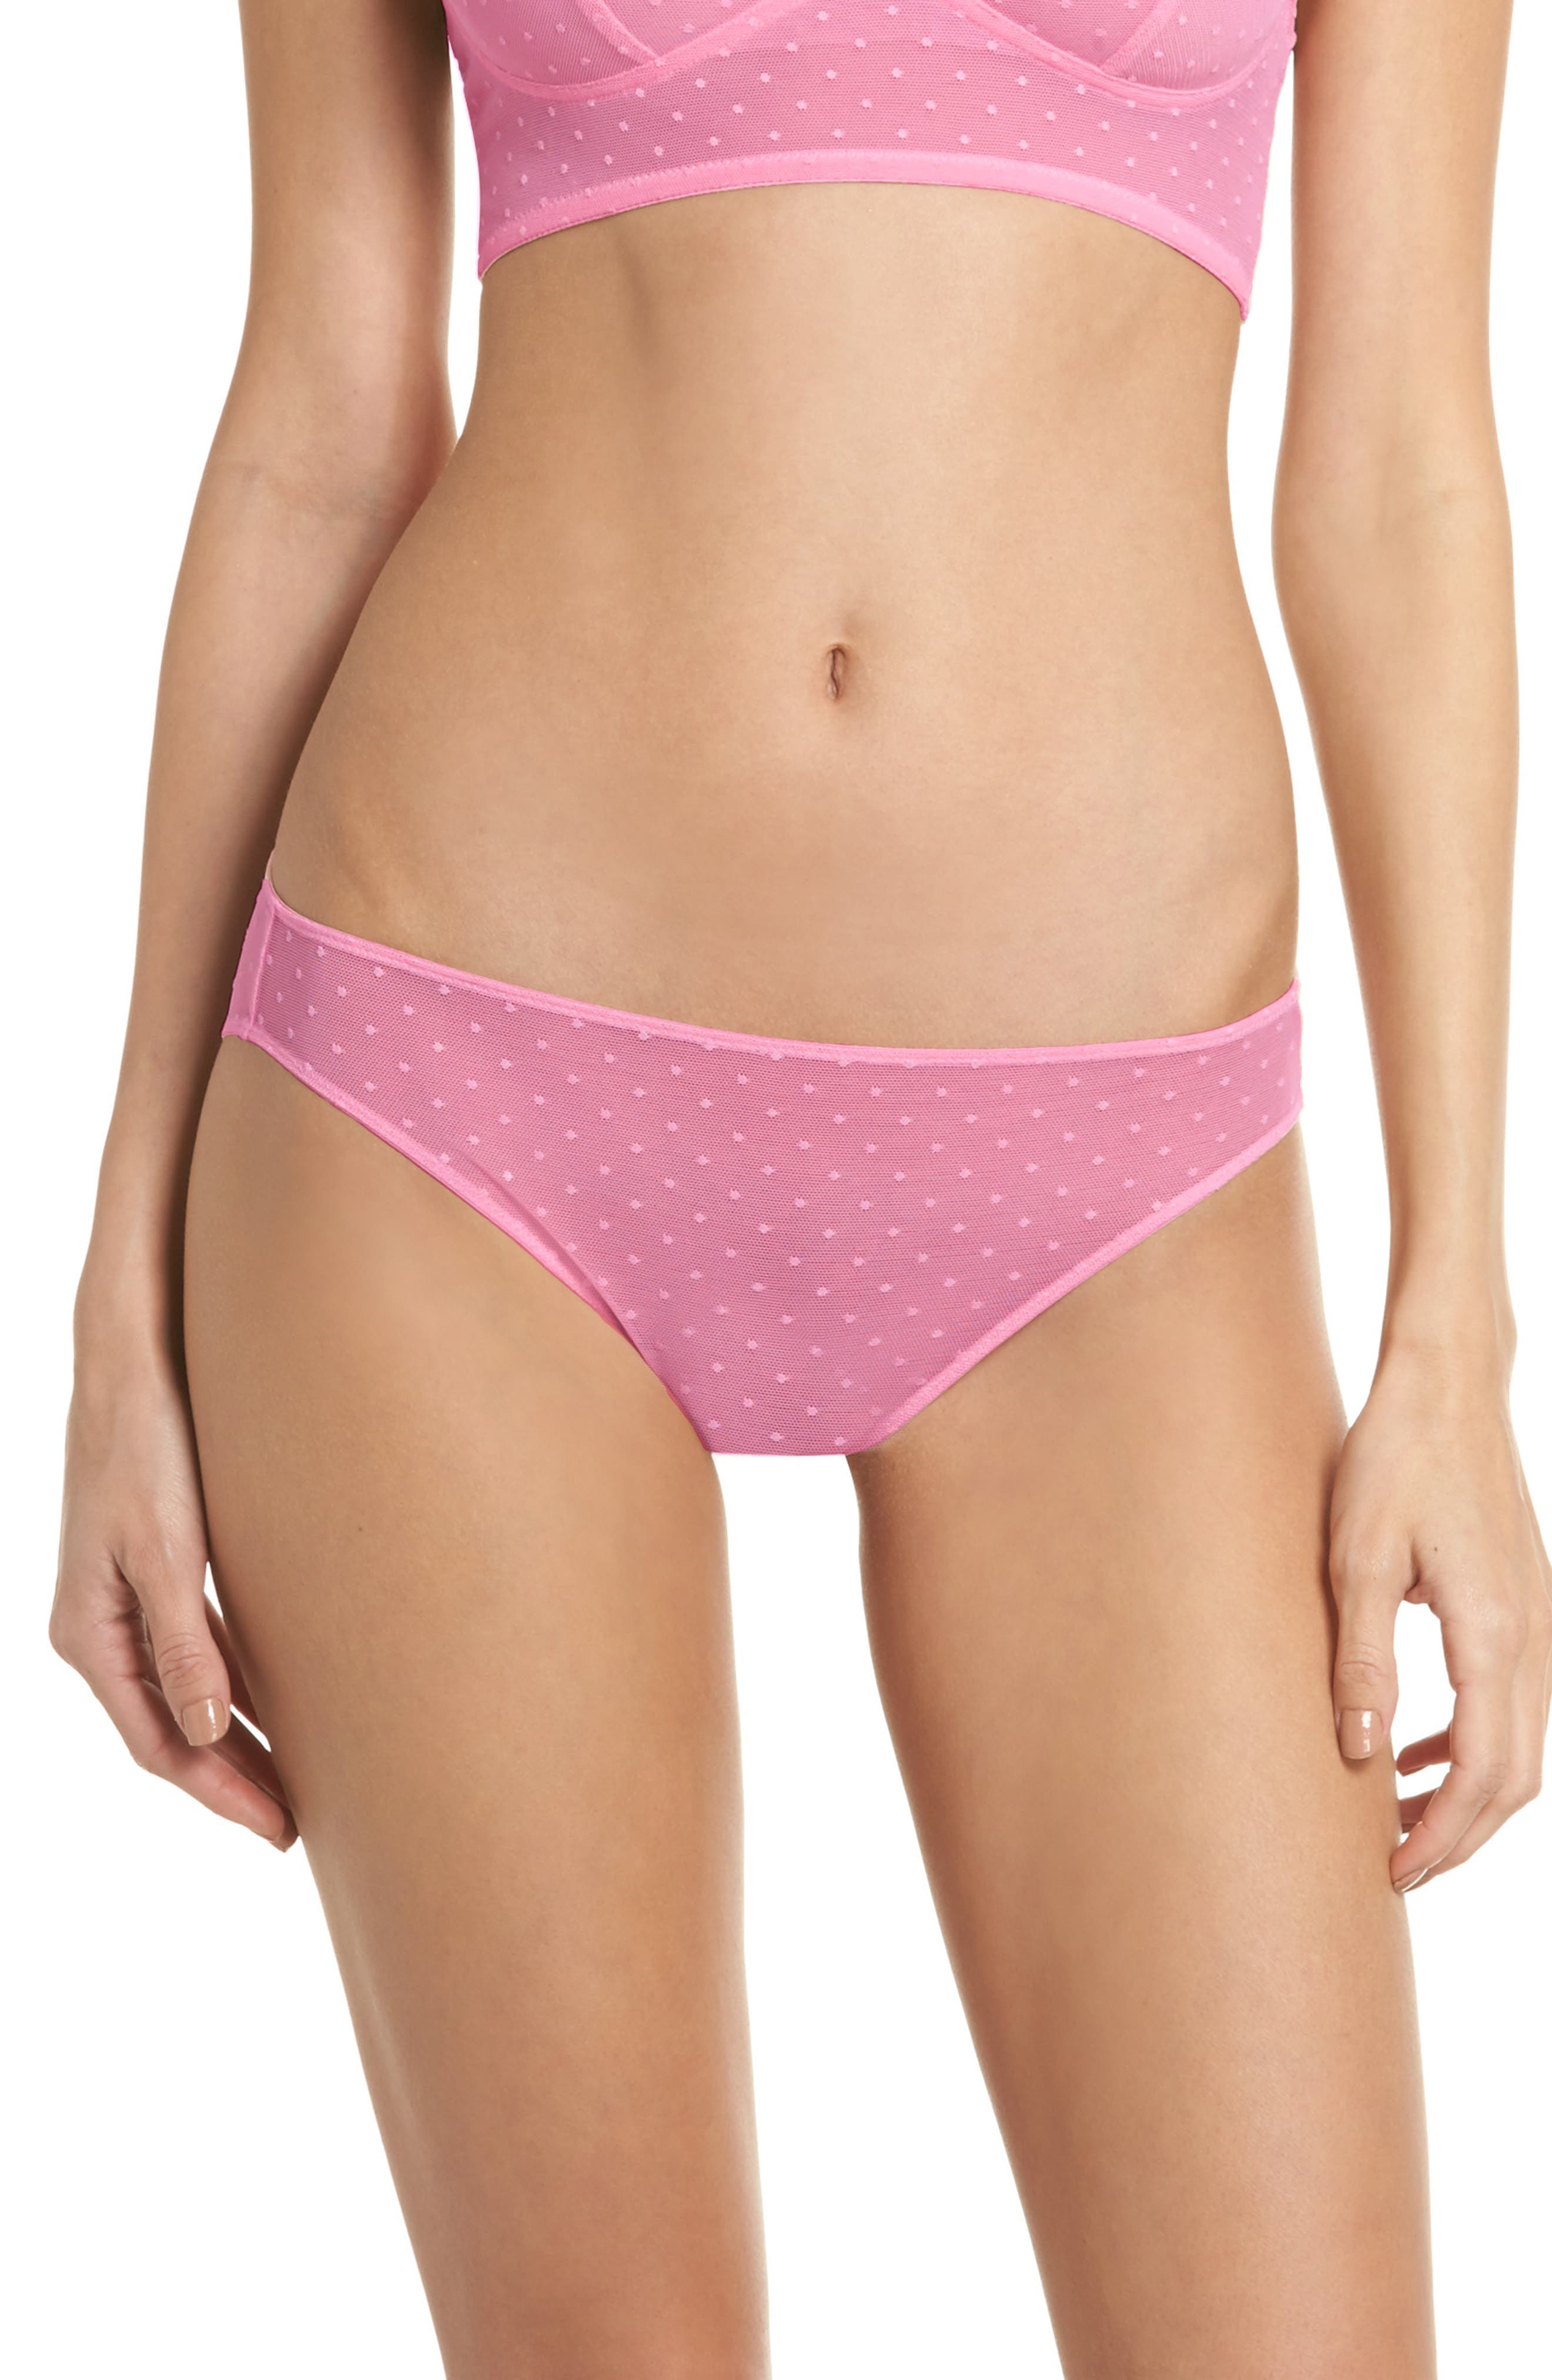 Swiss Dot Bikini,                             Main thumbnail 1, color,                             Candy Pink